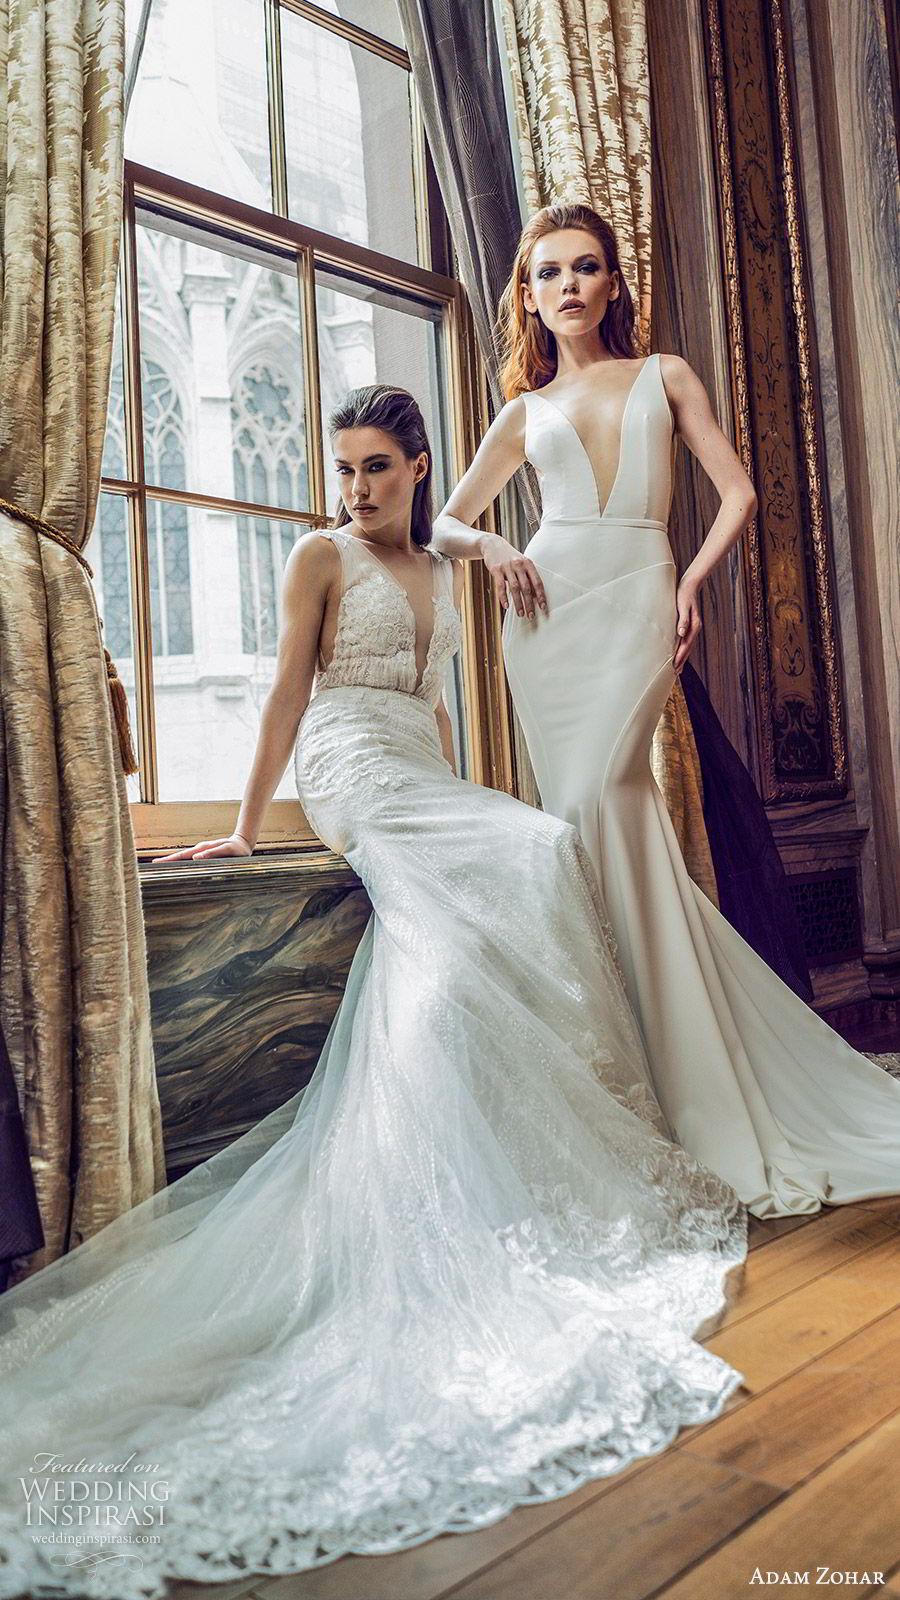 adam zohar 2020 bridal sleeveless straps deep v neckline minimal sheath wedding dress (4) clean modern chic lace chapel train fv